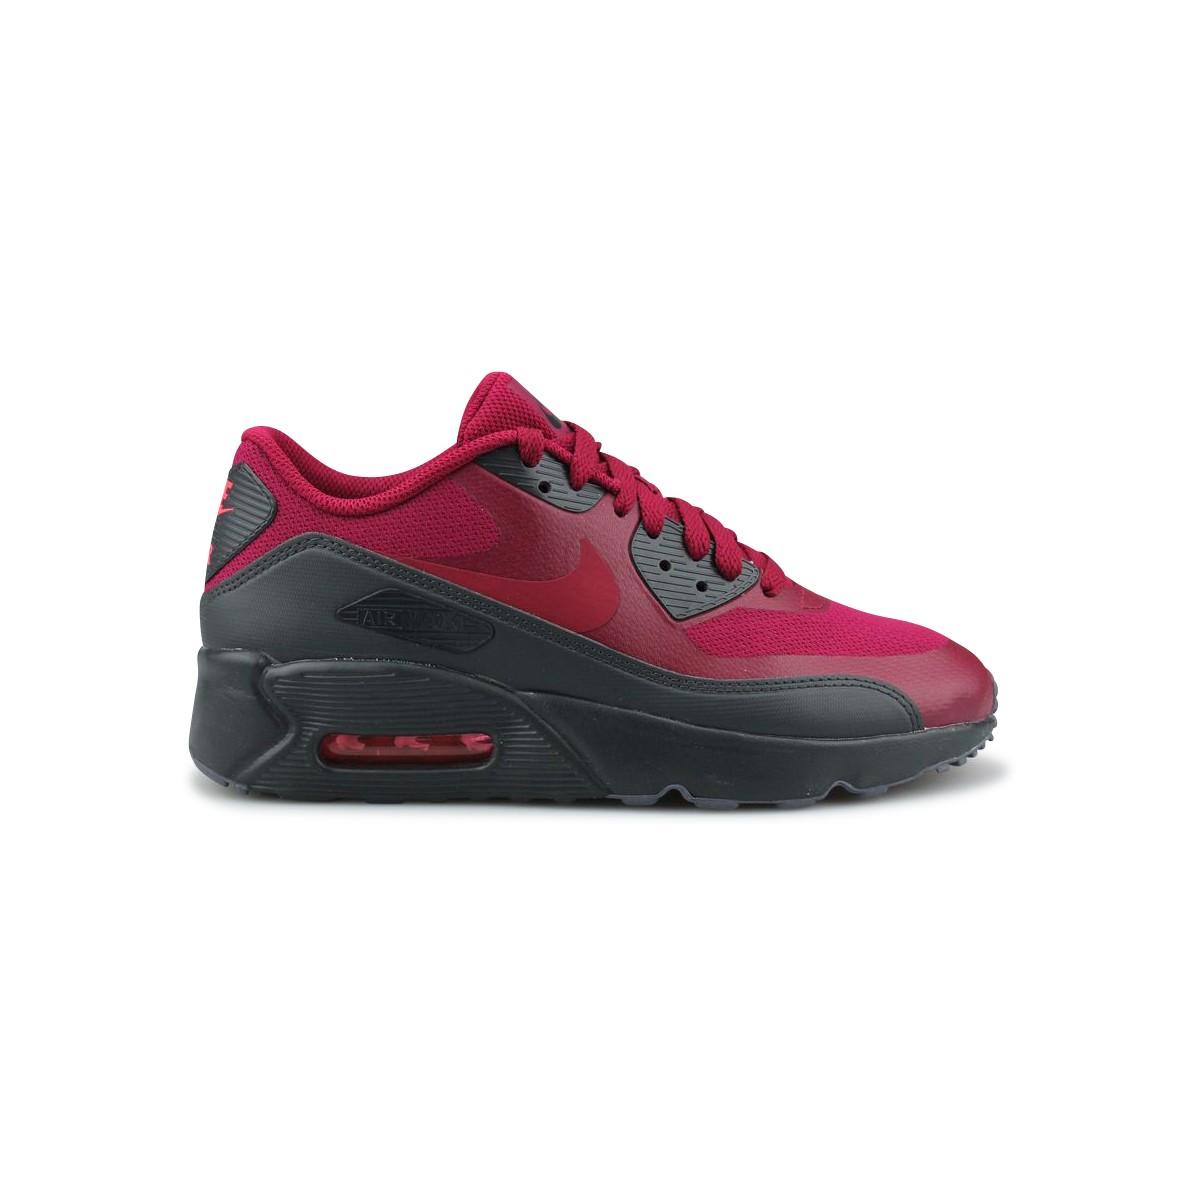 Basket Nike Air Max 90 Ultra 2.0 Junior - Ref. 869950-001 qnZwJ